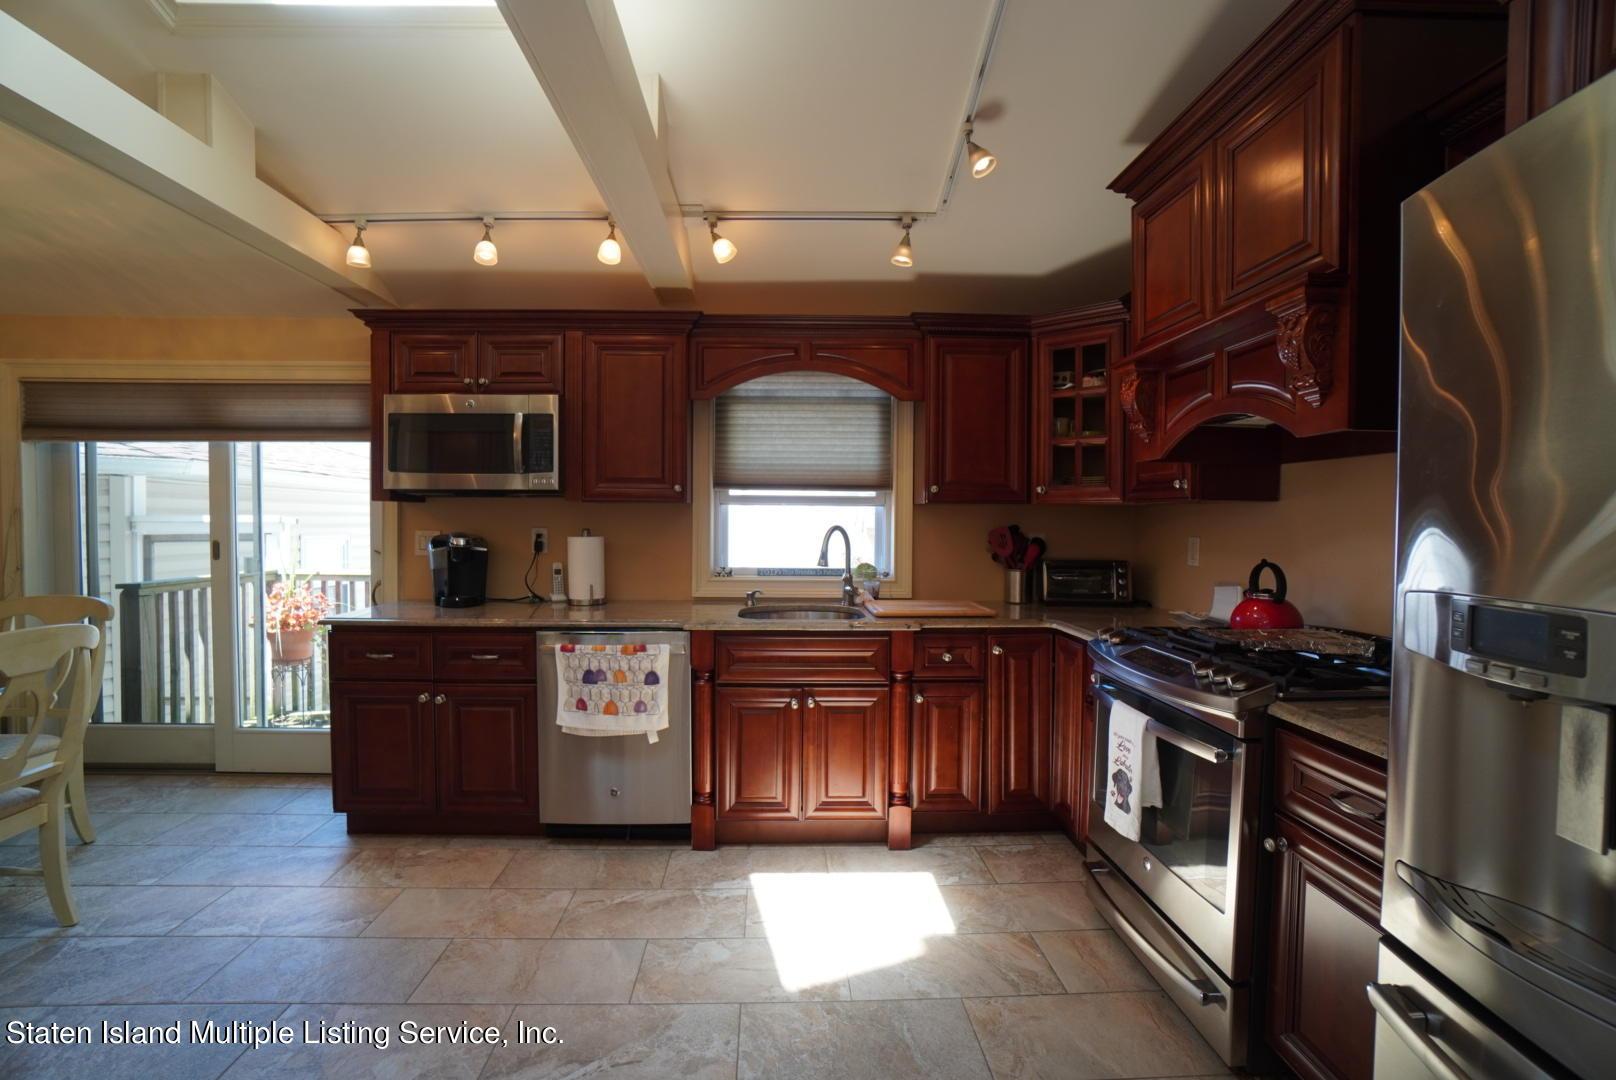 Single Family - Detached 264 Fisher Avenue  Staten Island, NY 10307, MLS-1146898-21